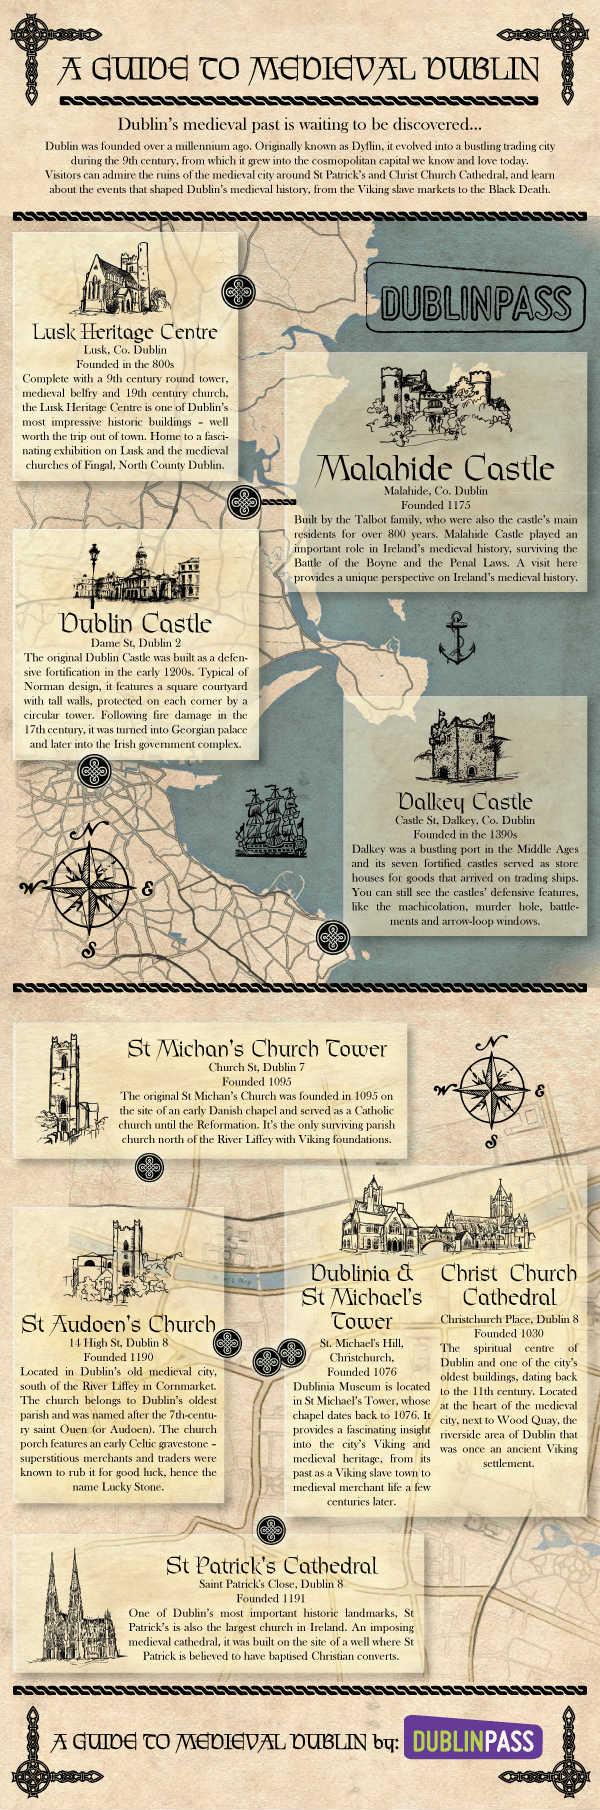 Medieval Dublin Infographic_Dublin Pass (1)s